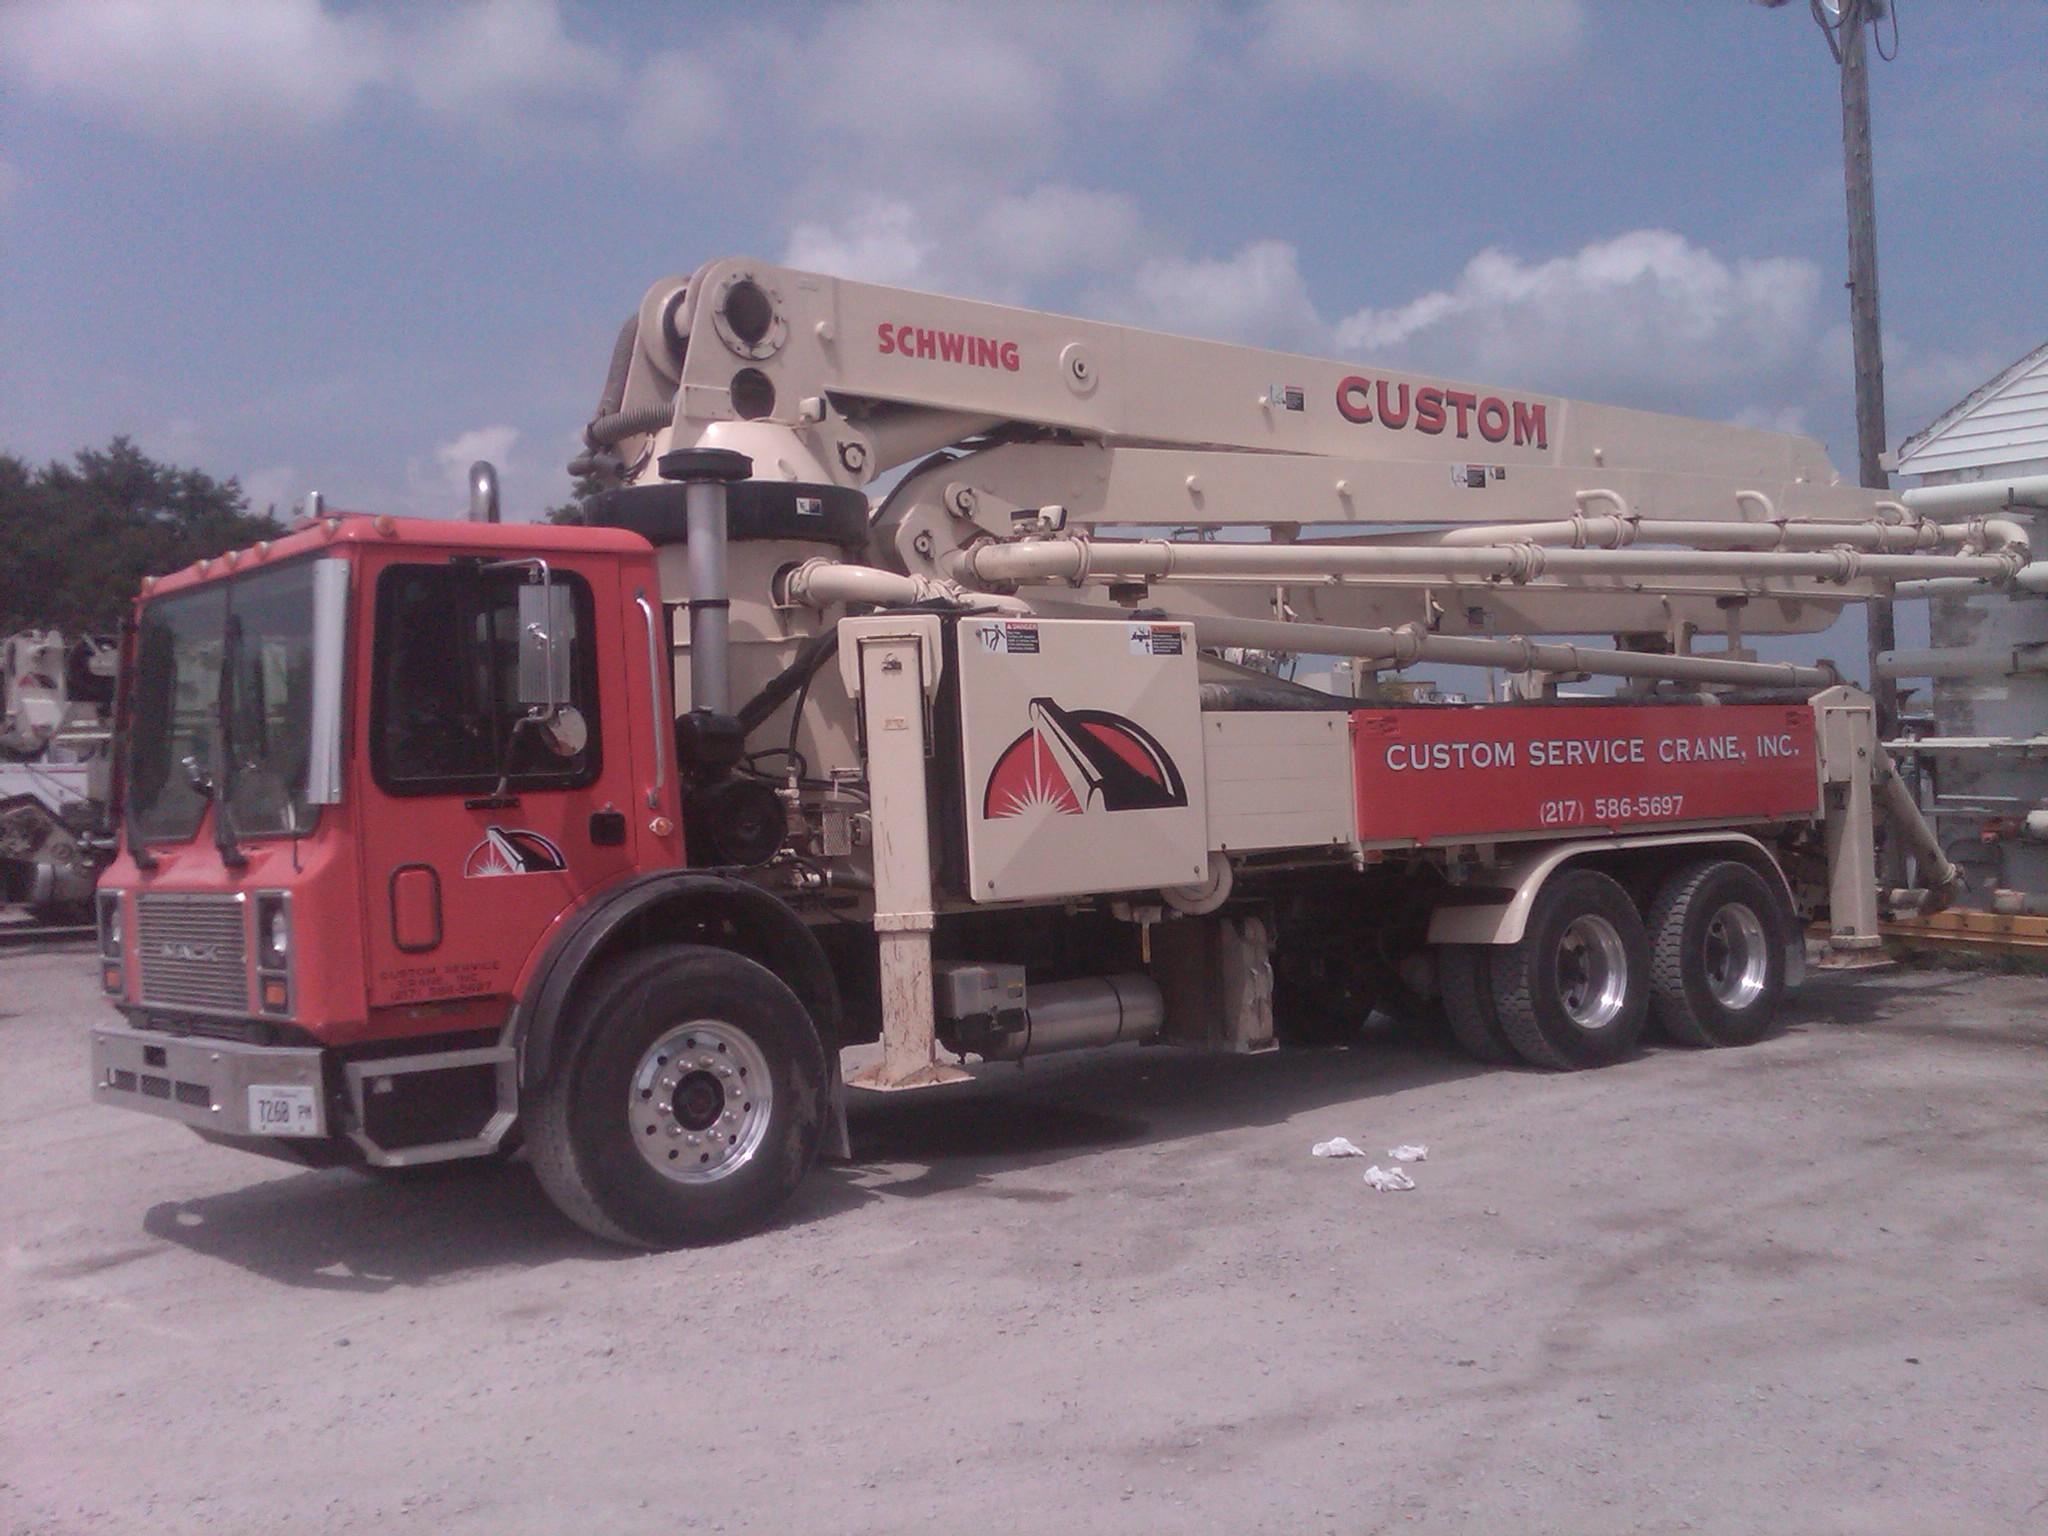 39 meter pump truck.